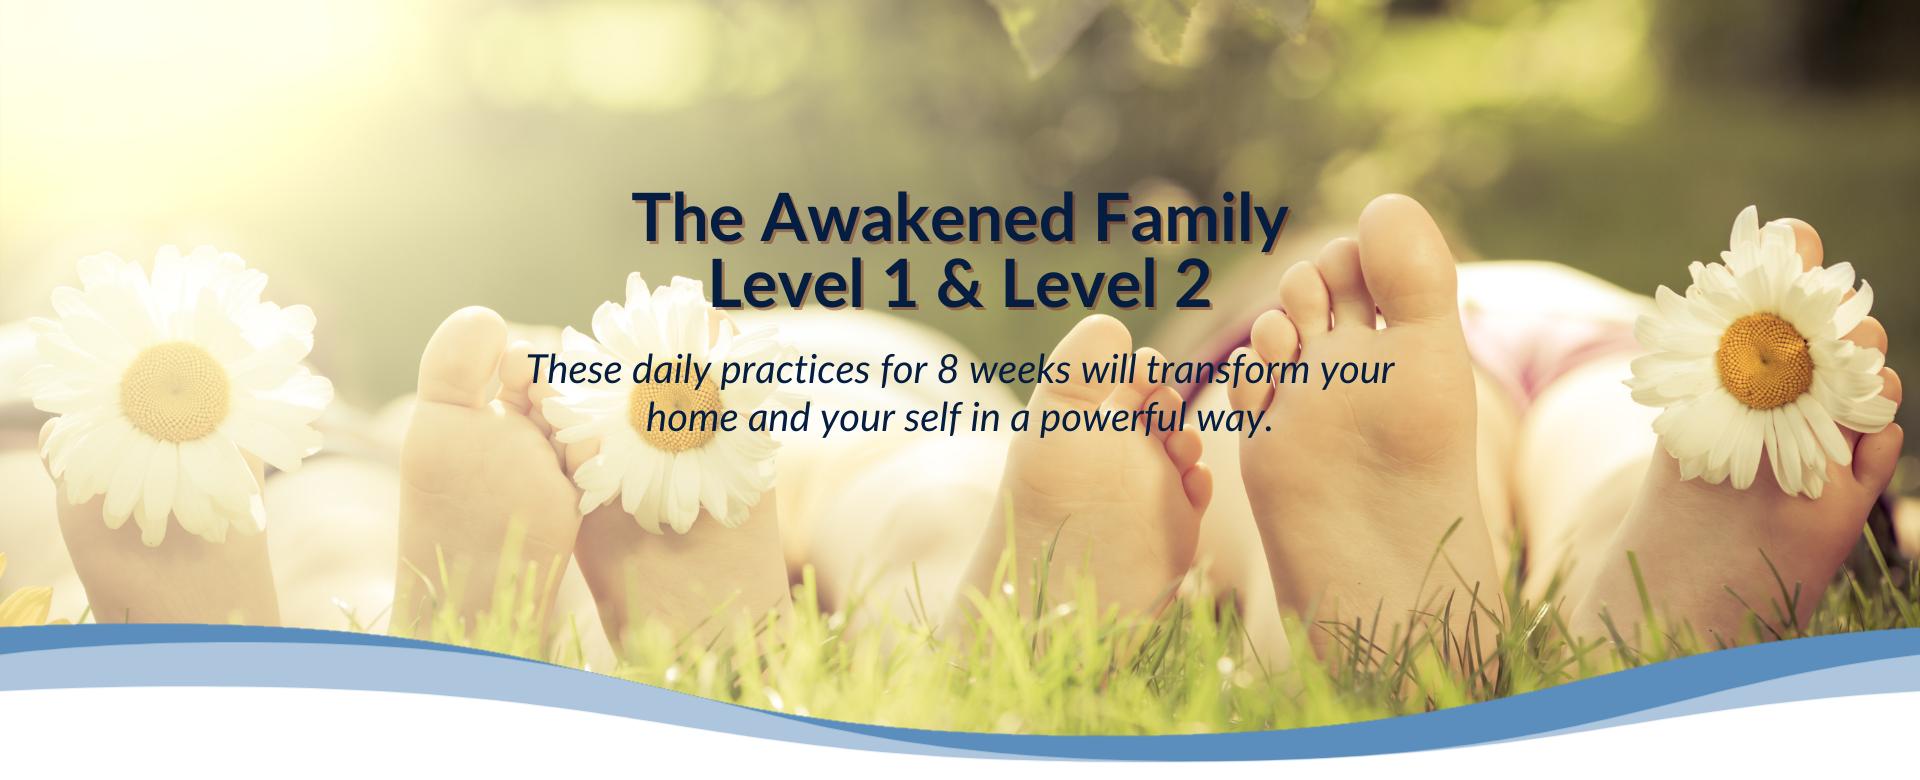 8 Weeks To An Awakened Family (Level 1 & 2)